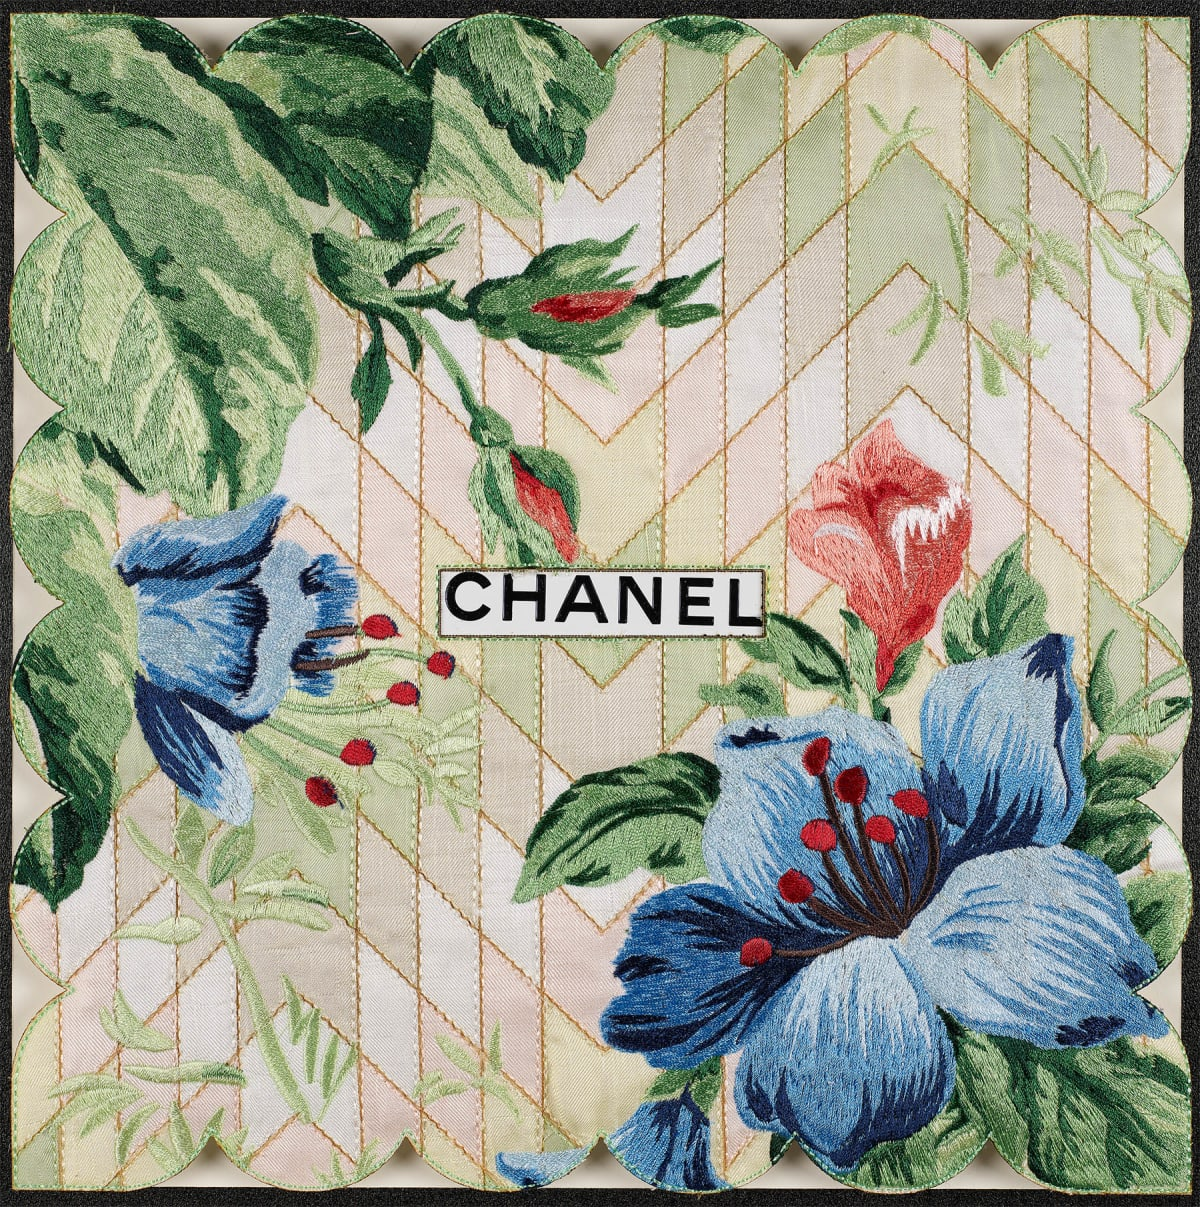 Stephen Wilson, Chanel Mint Chevron, 2020